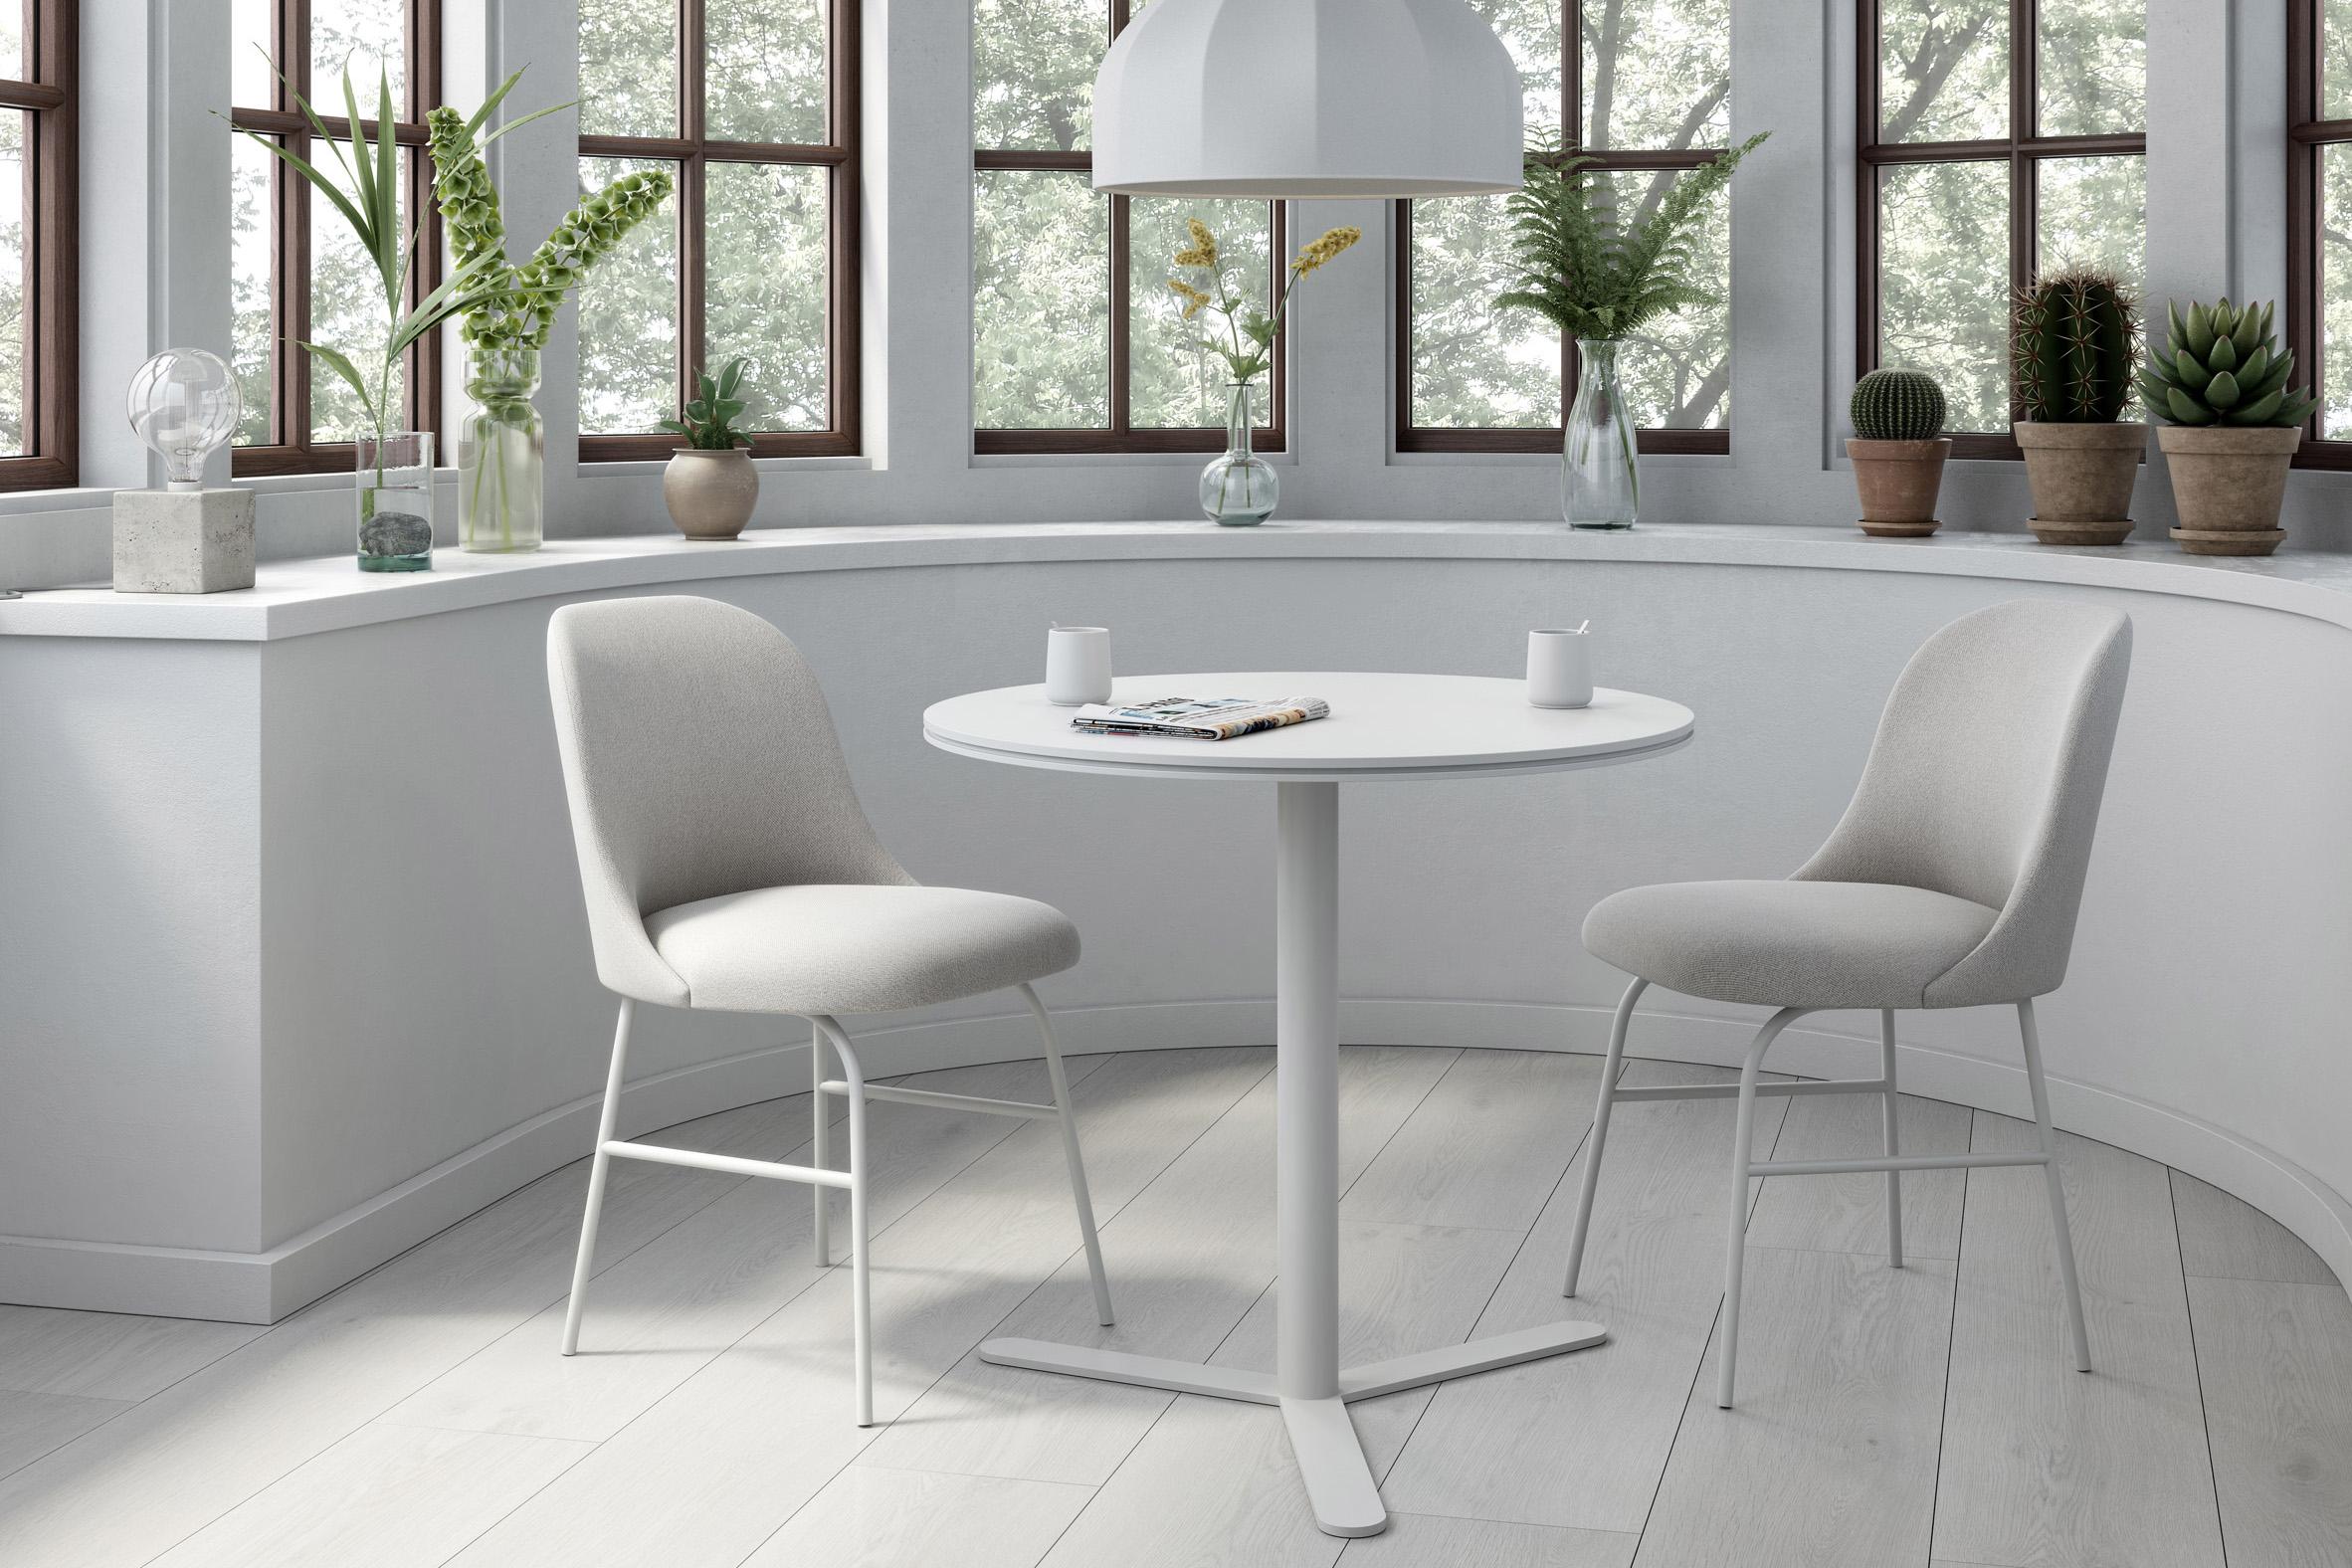 viccabe-aleta-jaime-hayon-design-furniture-chairs_dezeen_2364_col_9.jpg